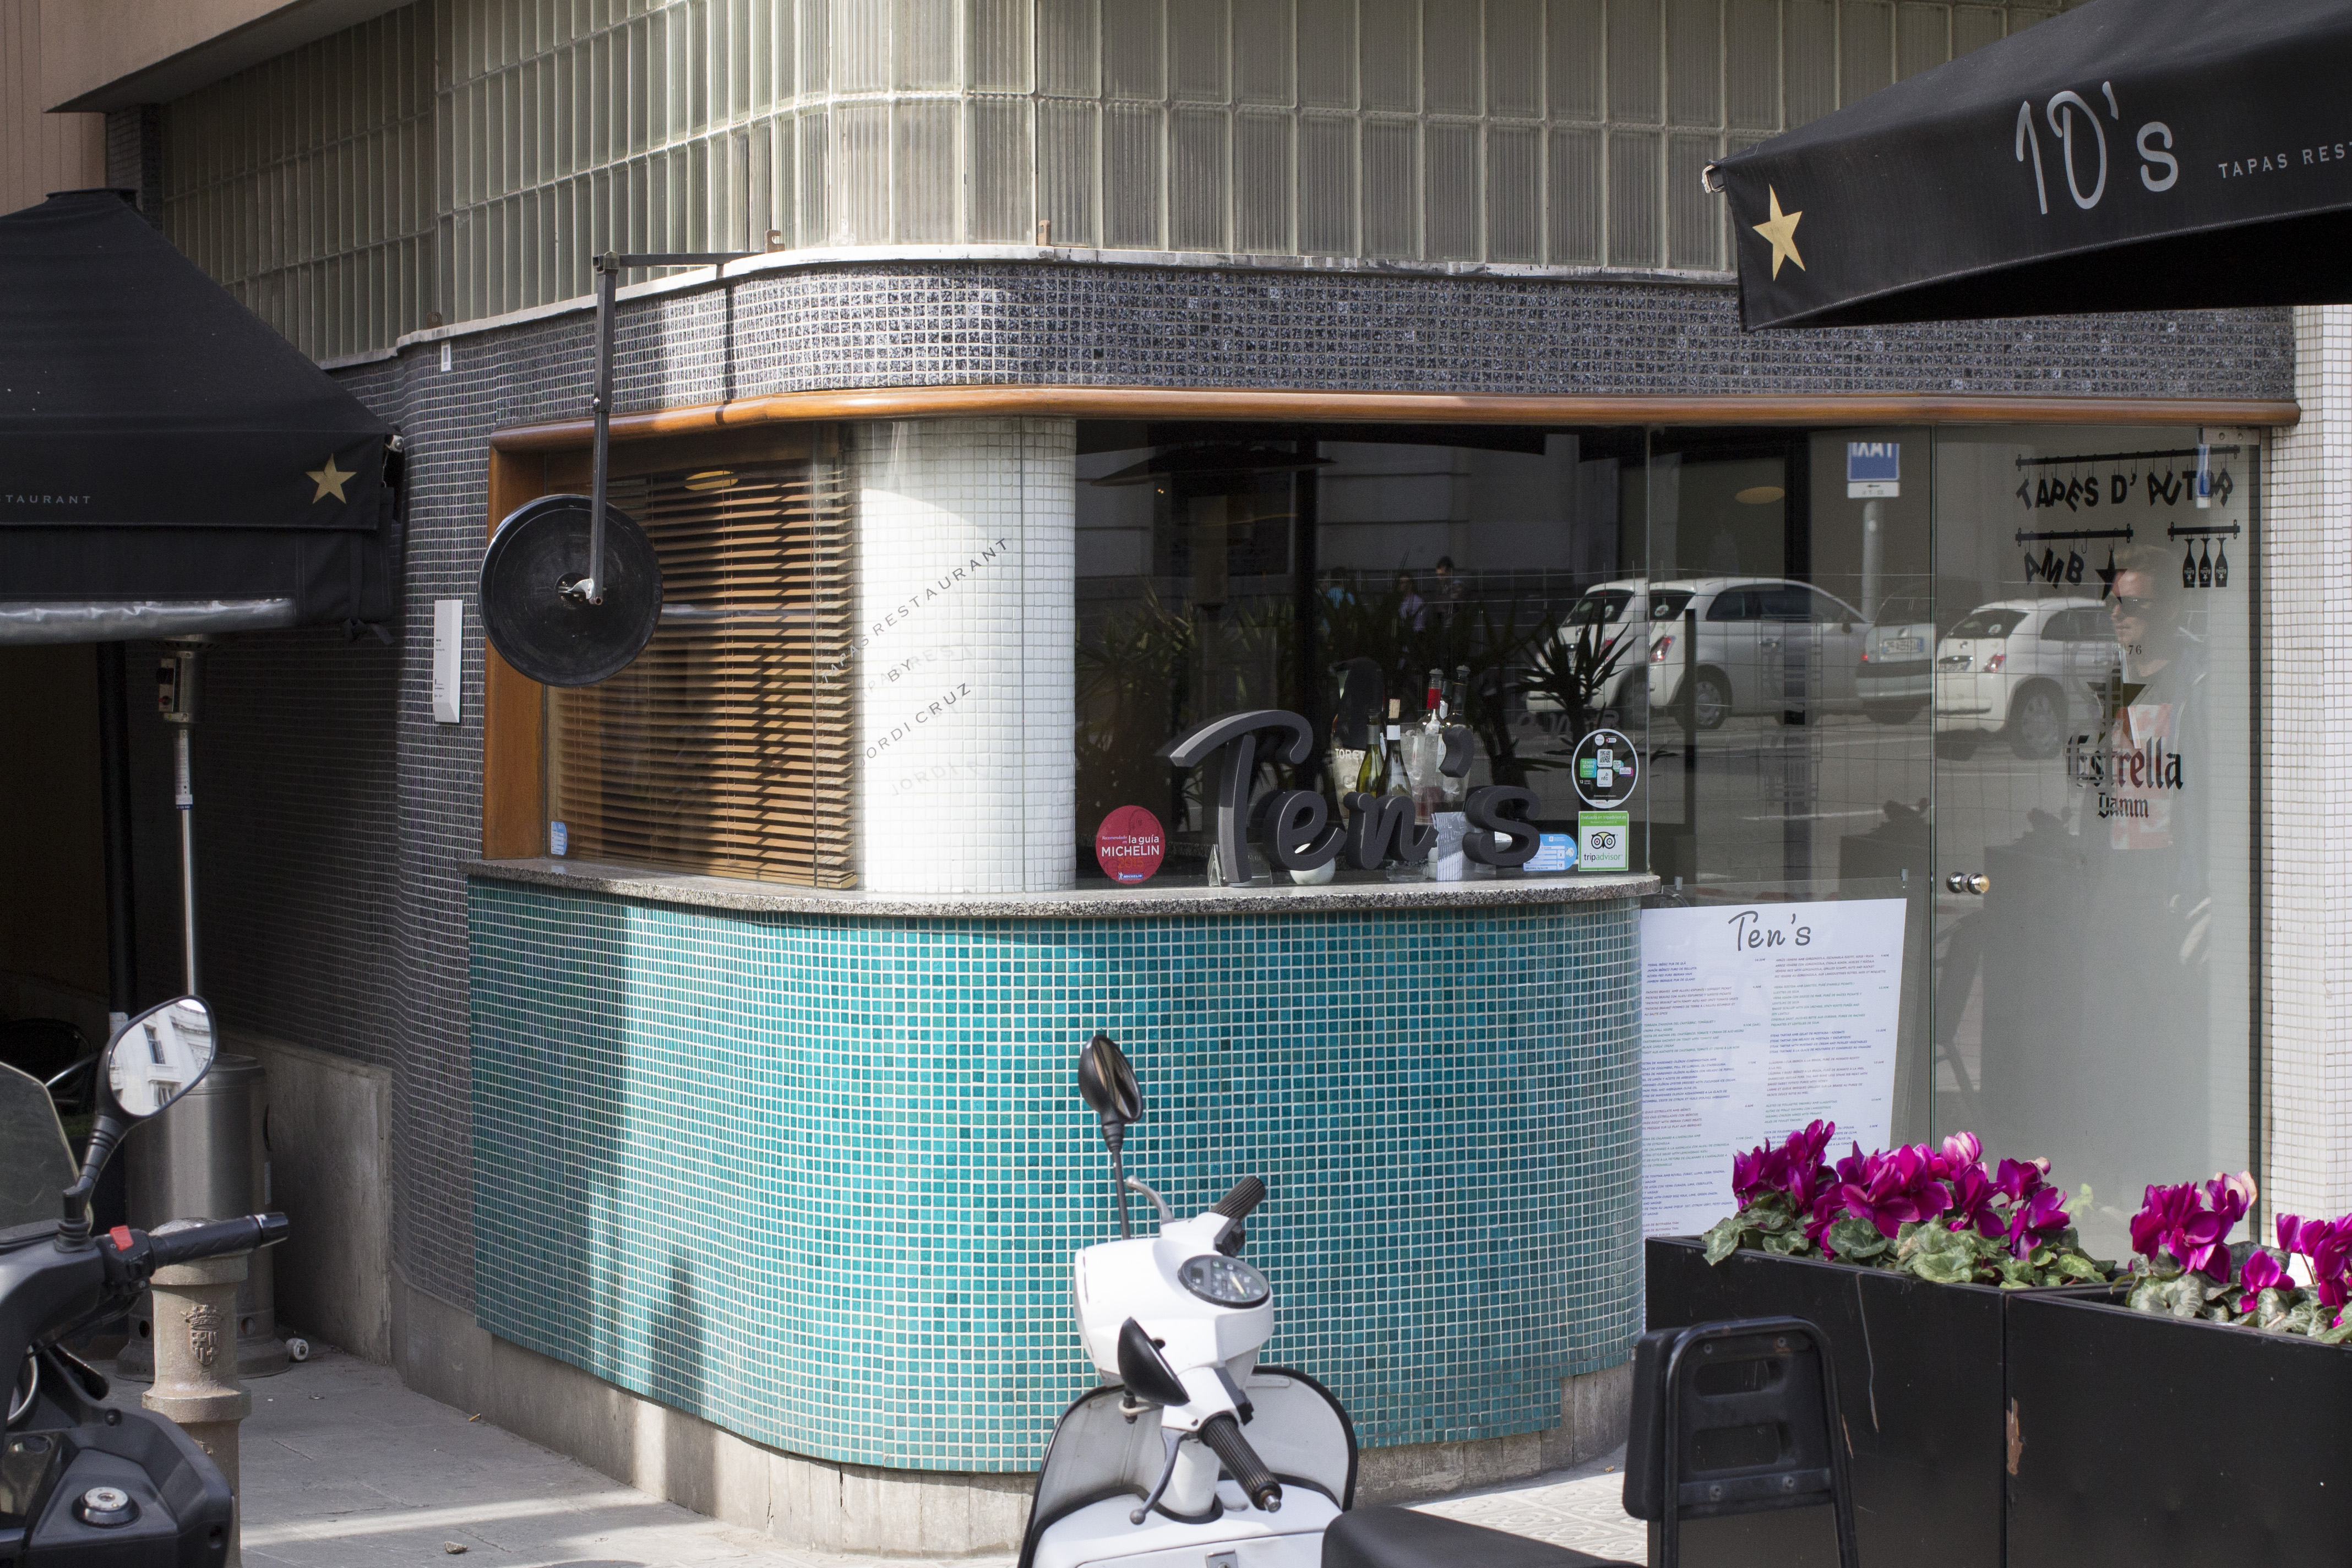 ingresso, Ten's, Tapas Bar, Barcellona